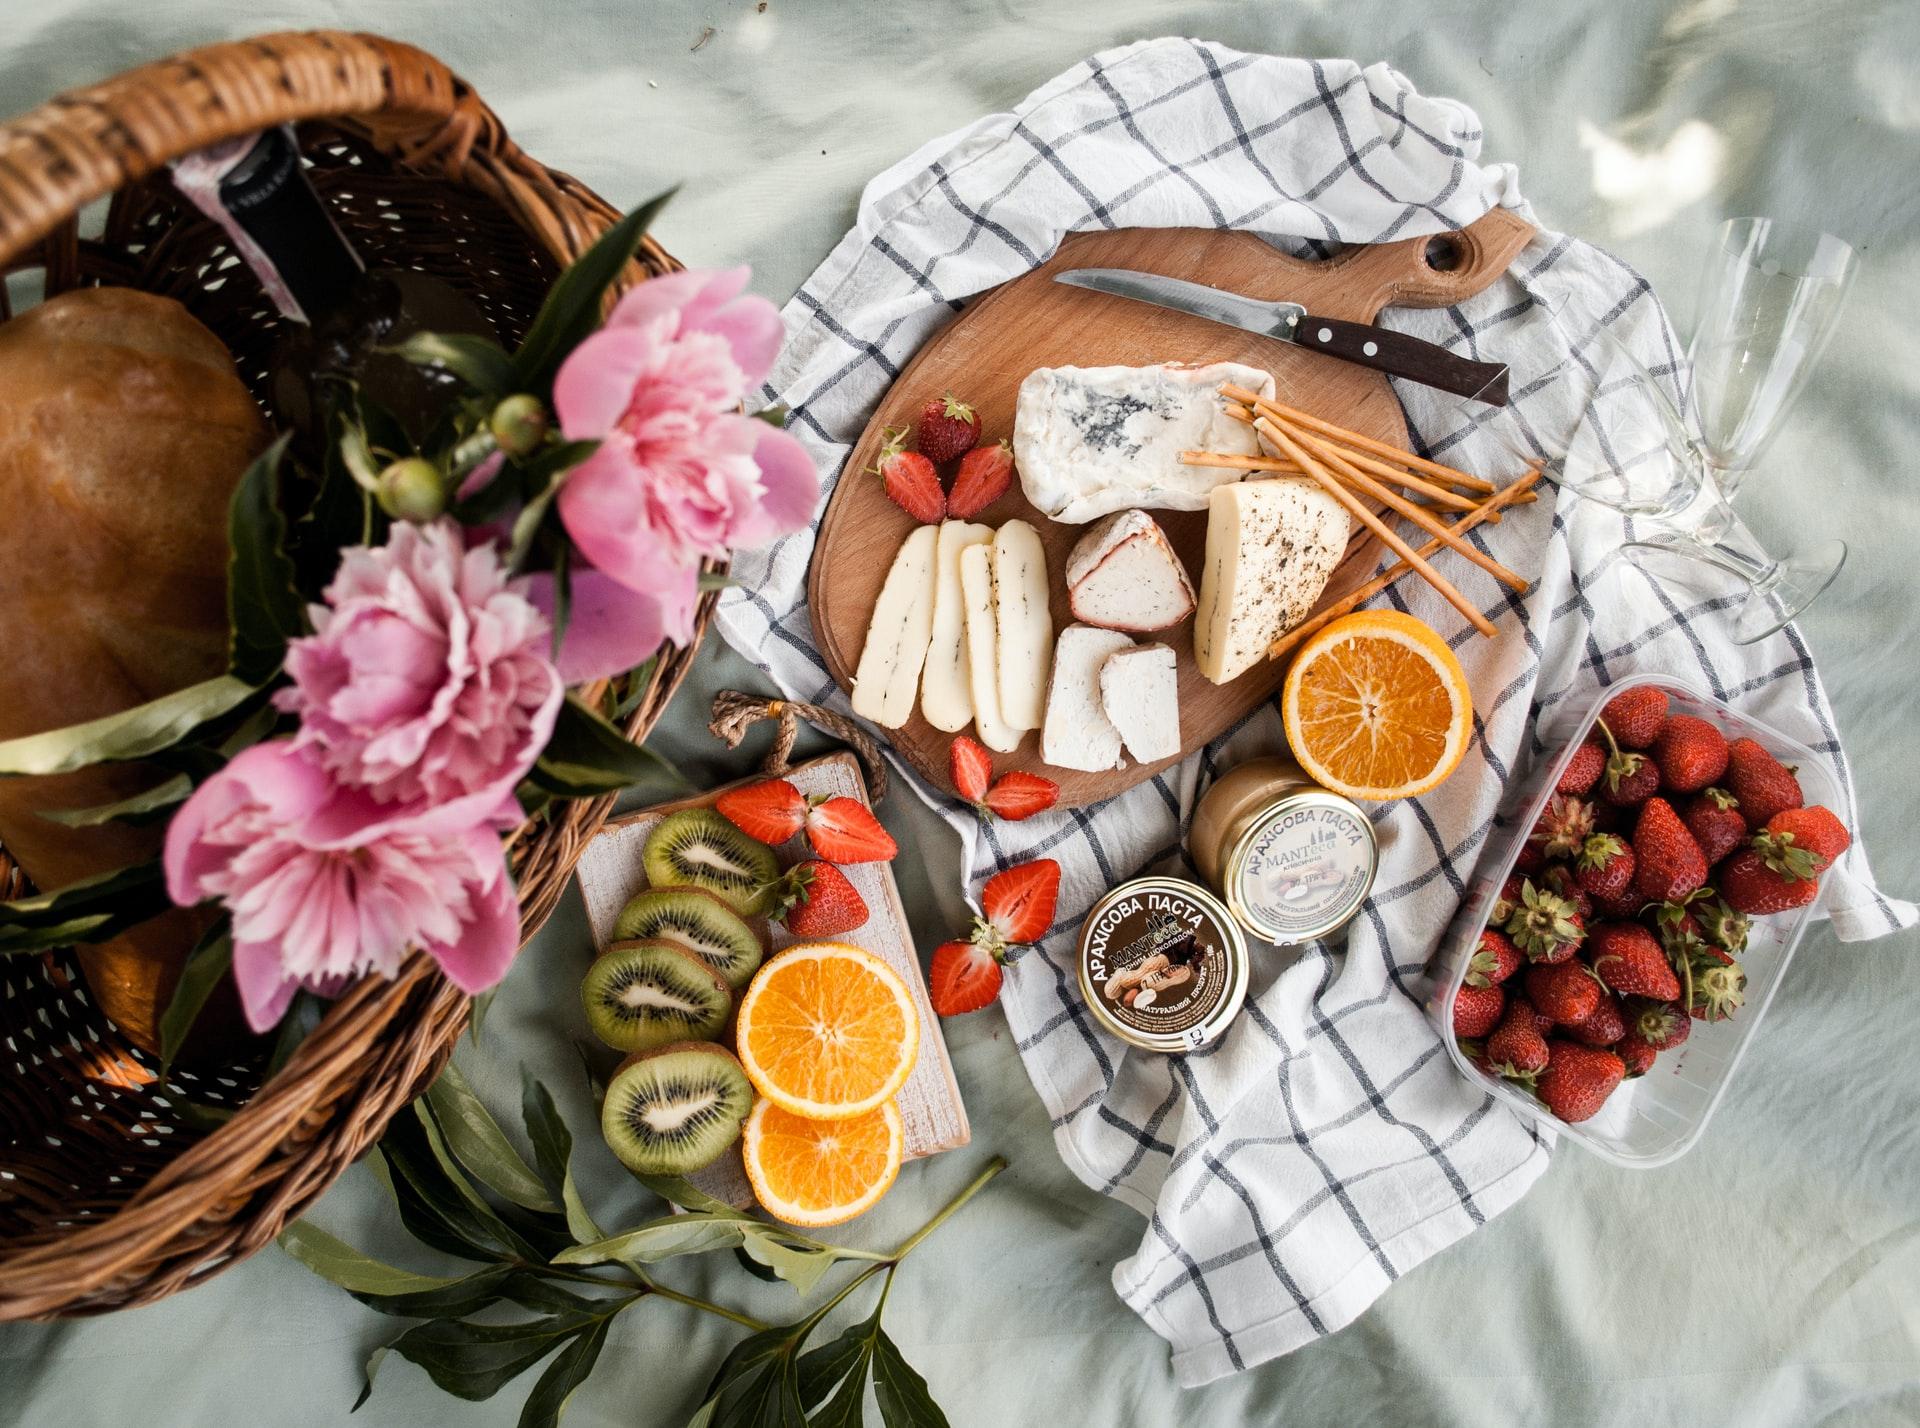 French picnic